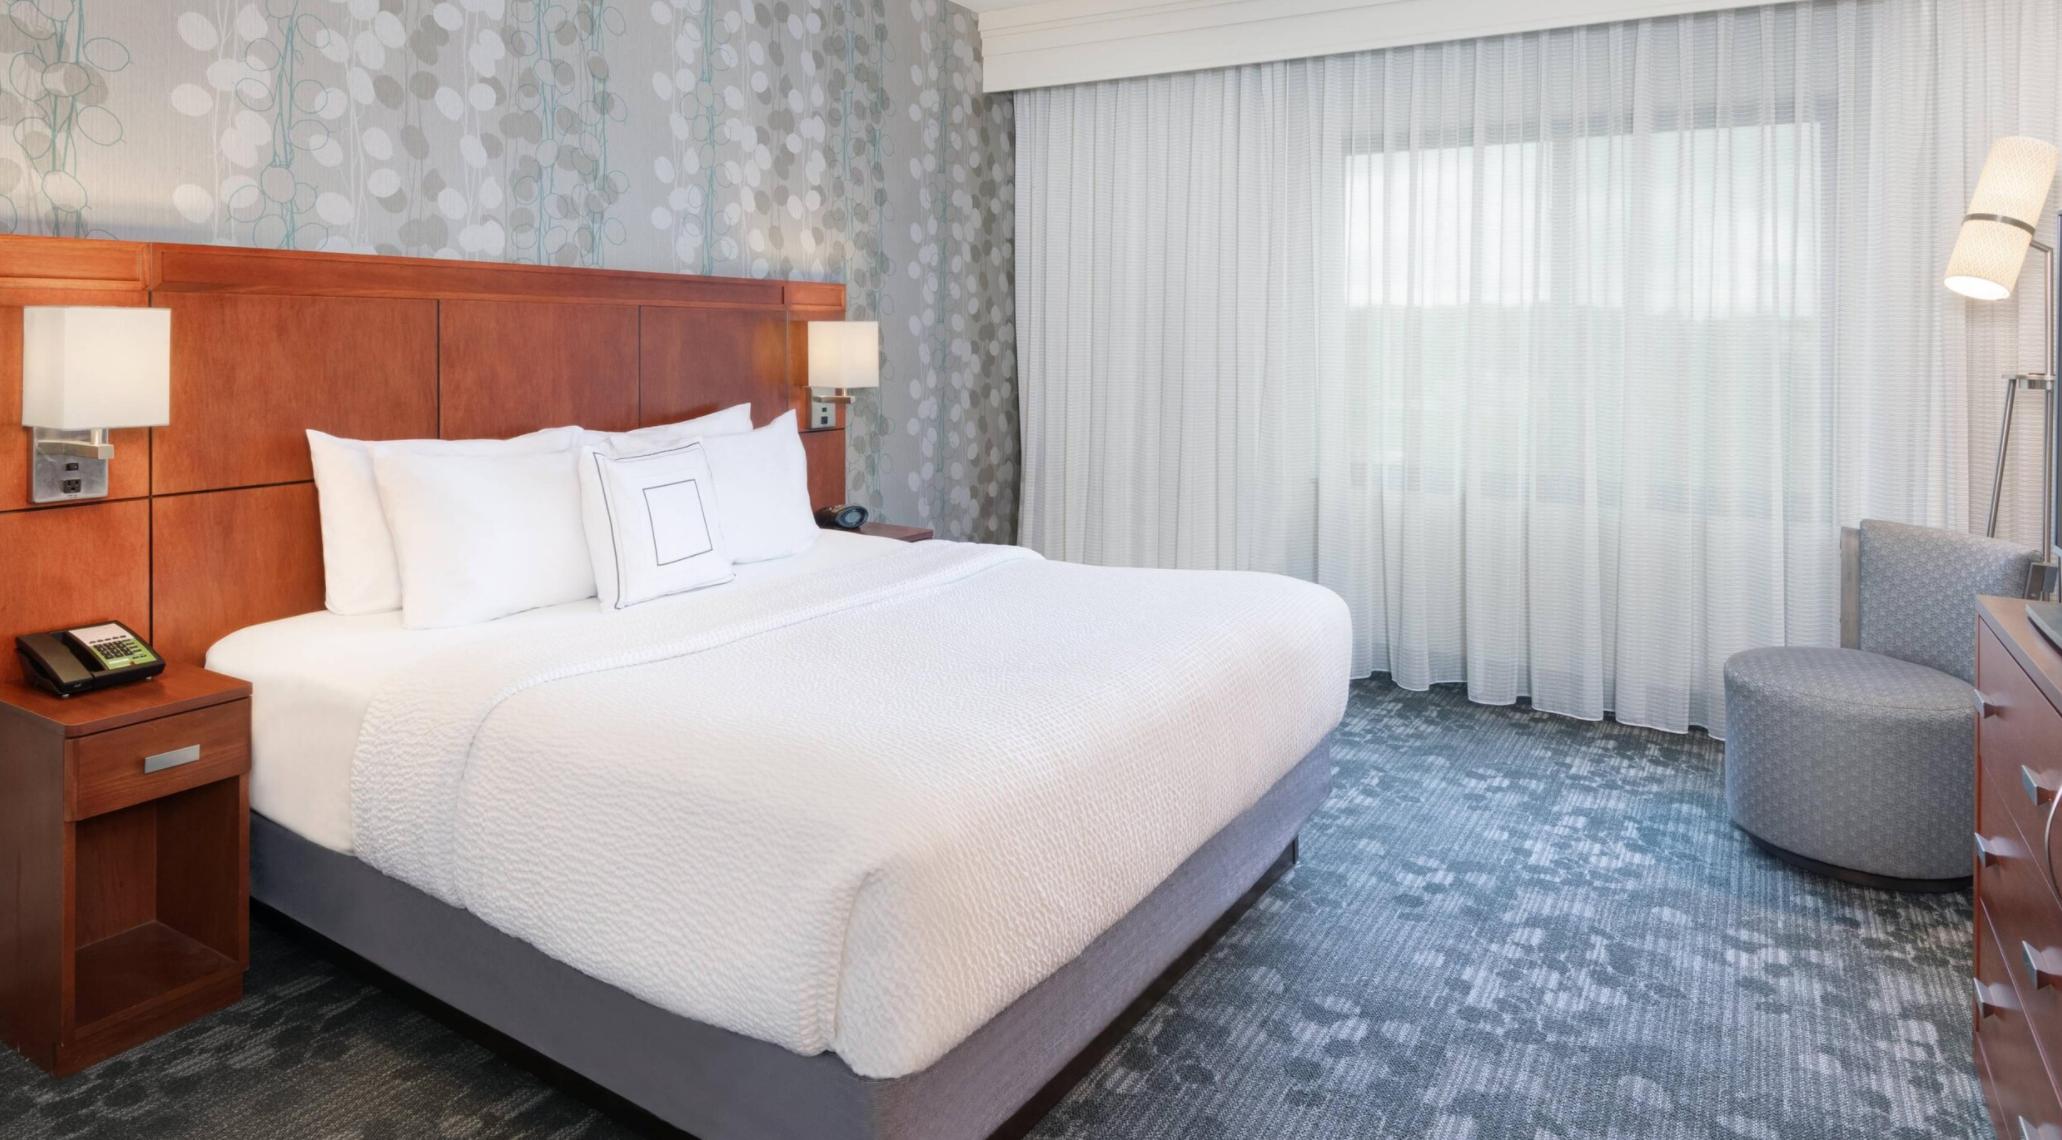 https://www.hotelsbyday.com/_data/default-hotel_image/3/18063/screenshot-2020-06-10-at-7-02-49-pm.png